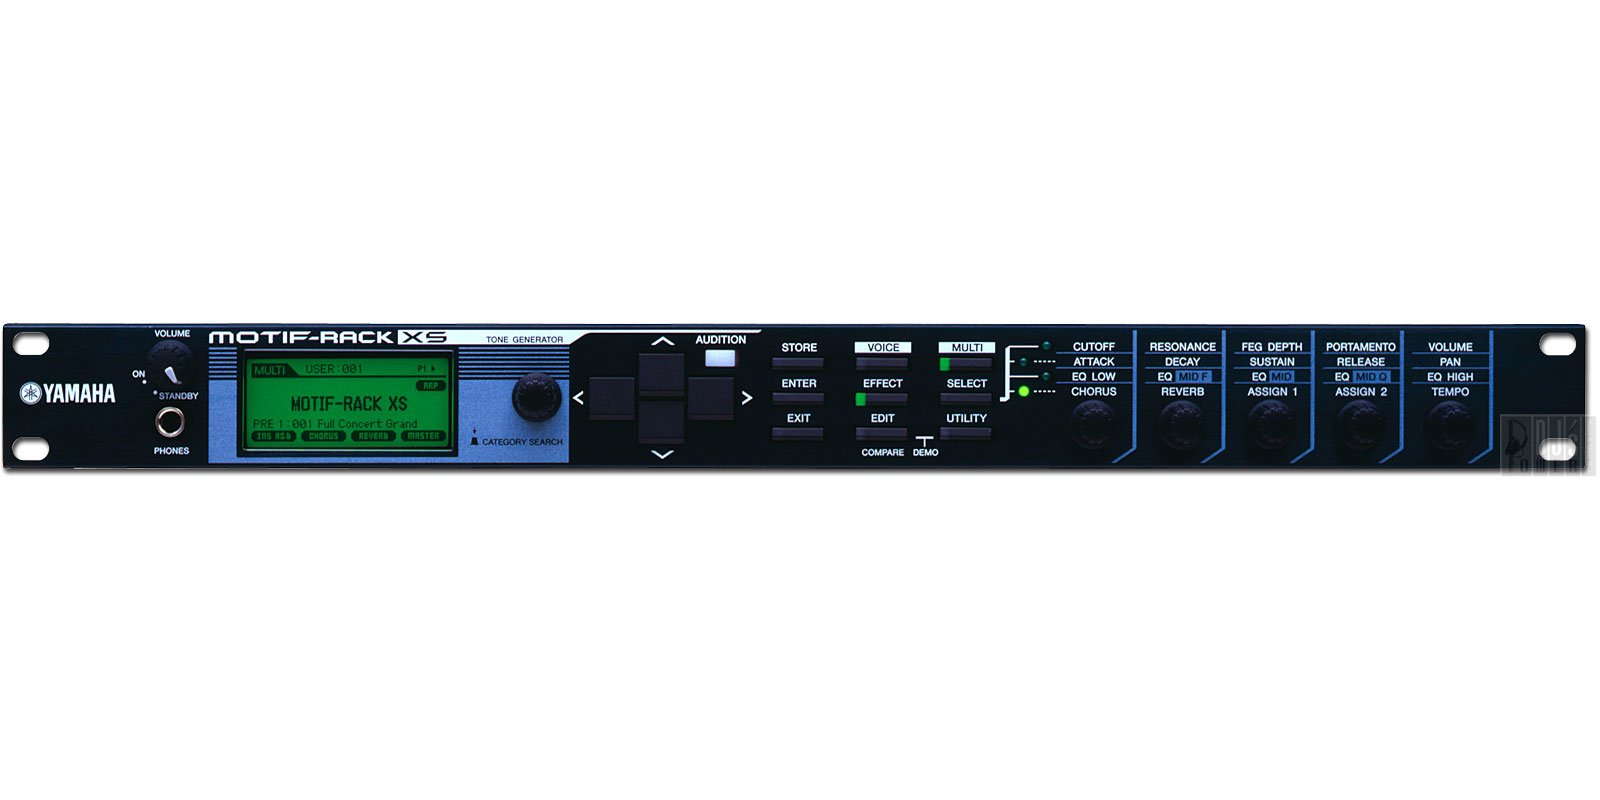 Yamaha Motif XS Rack Mount Sound Module